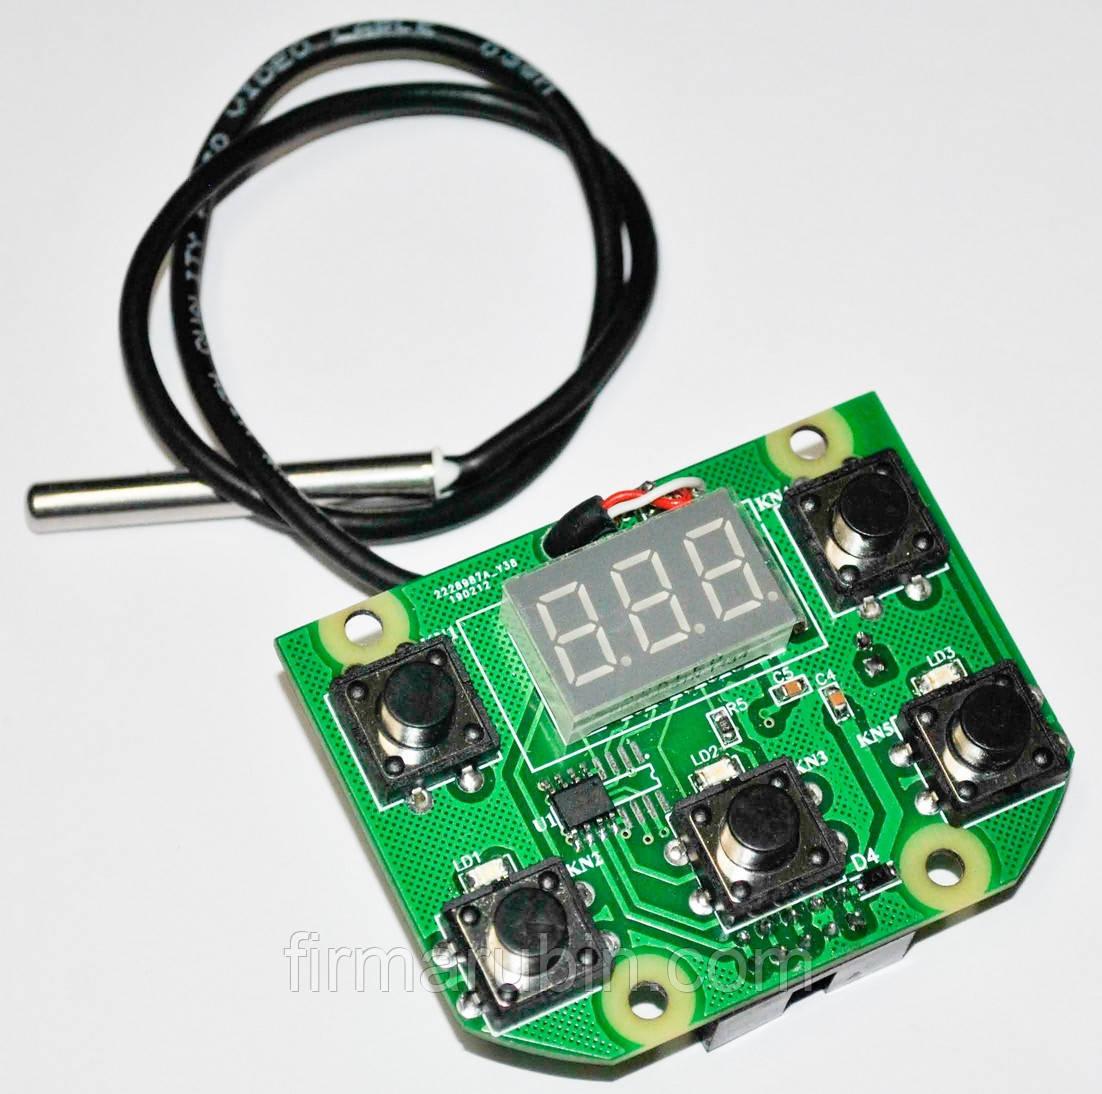 Терморегулятор TRW3004 (12V)